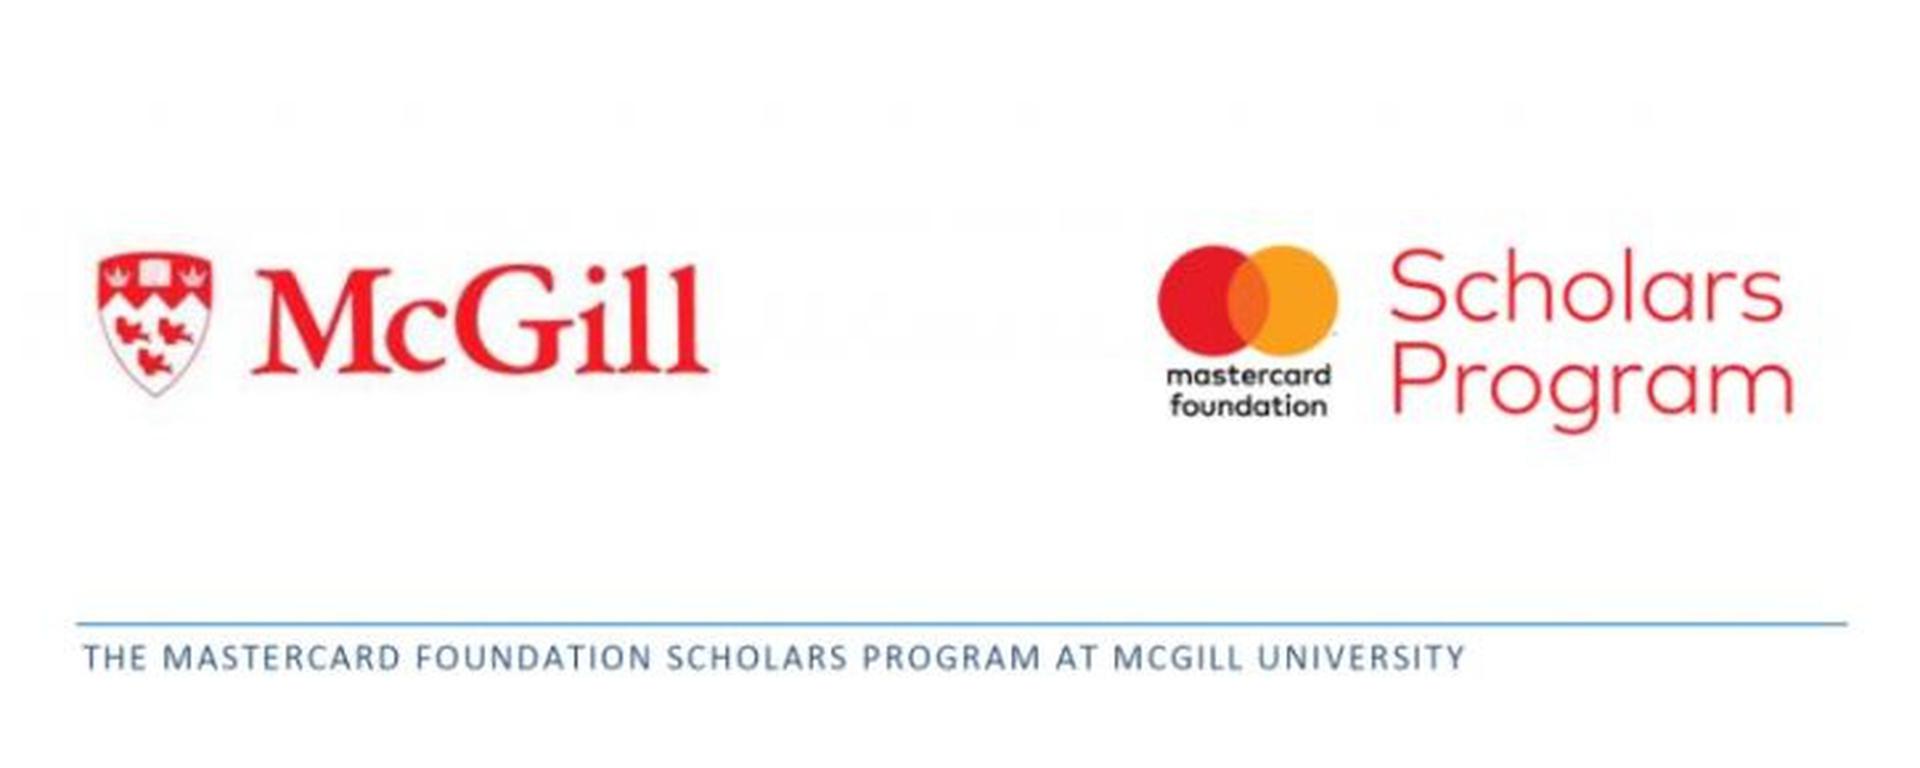 Mastercard Foundation - Mastercard Foundation Scholars Program 2020/2021 Movemeback African initiative cover image